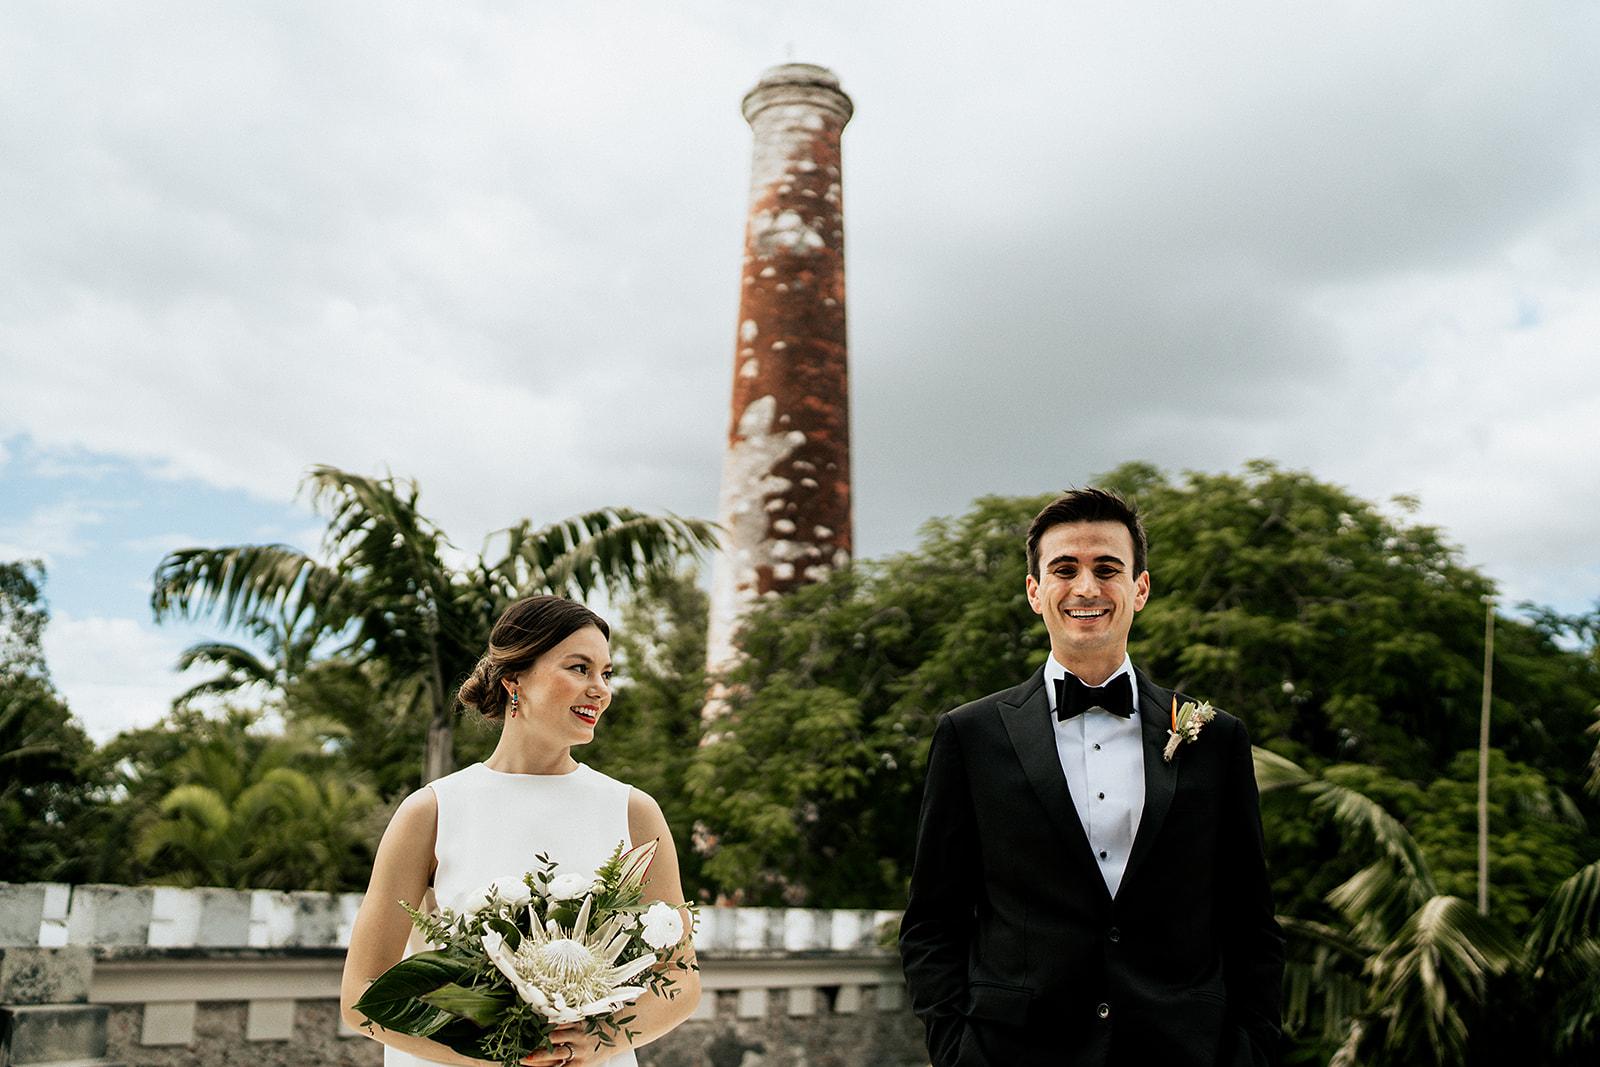 AmandaMarkus-Hacienda-Sac-Chich-Merida-Wedding-150_websize.jpg